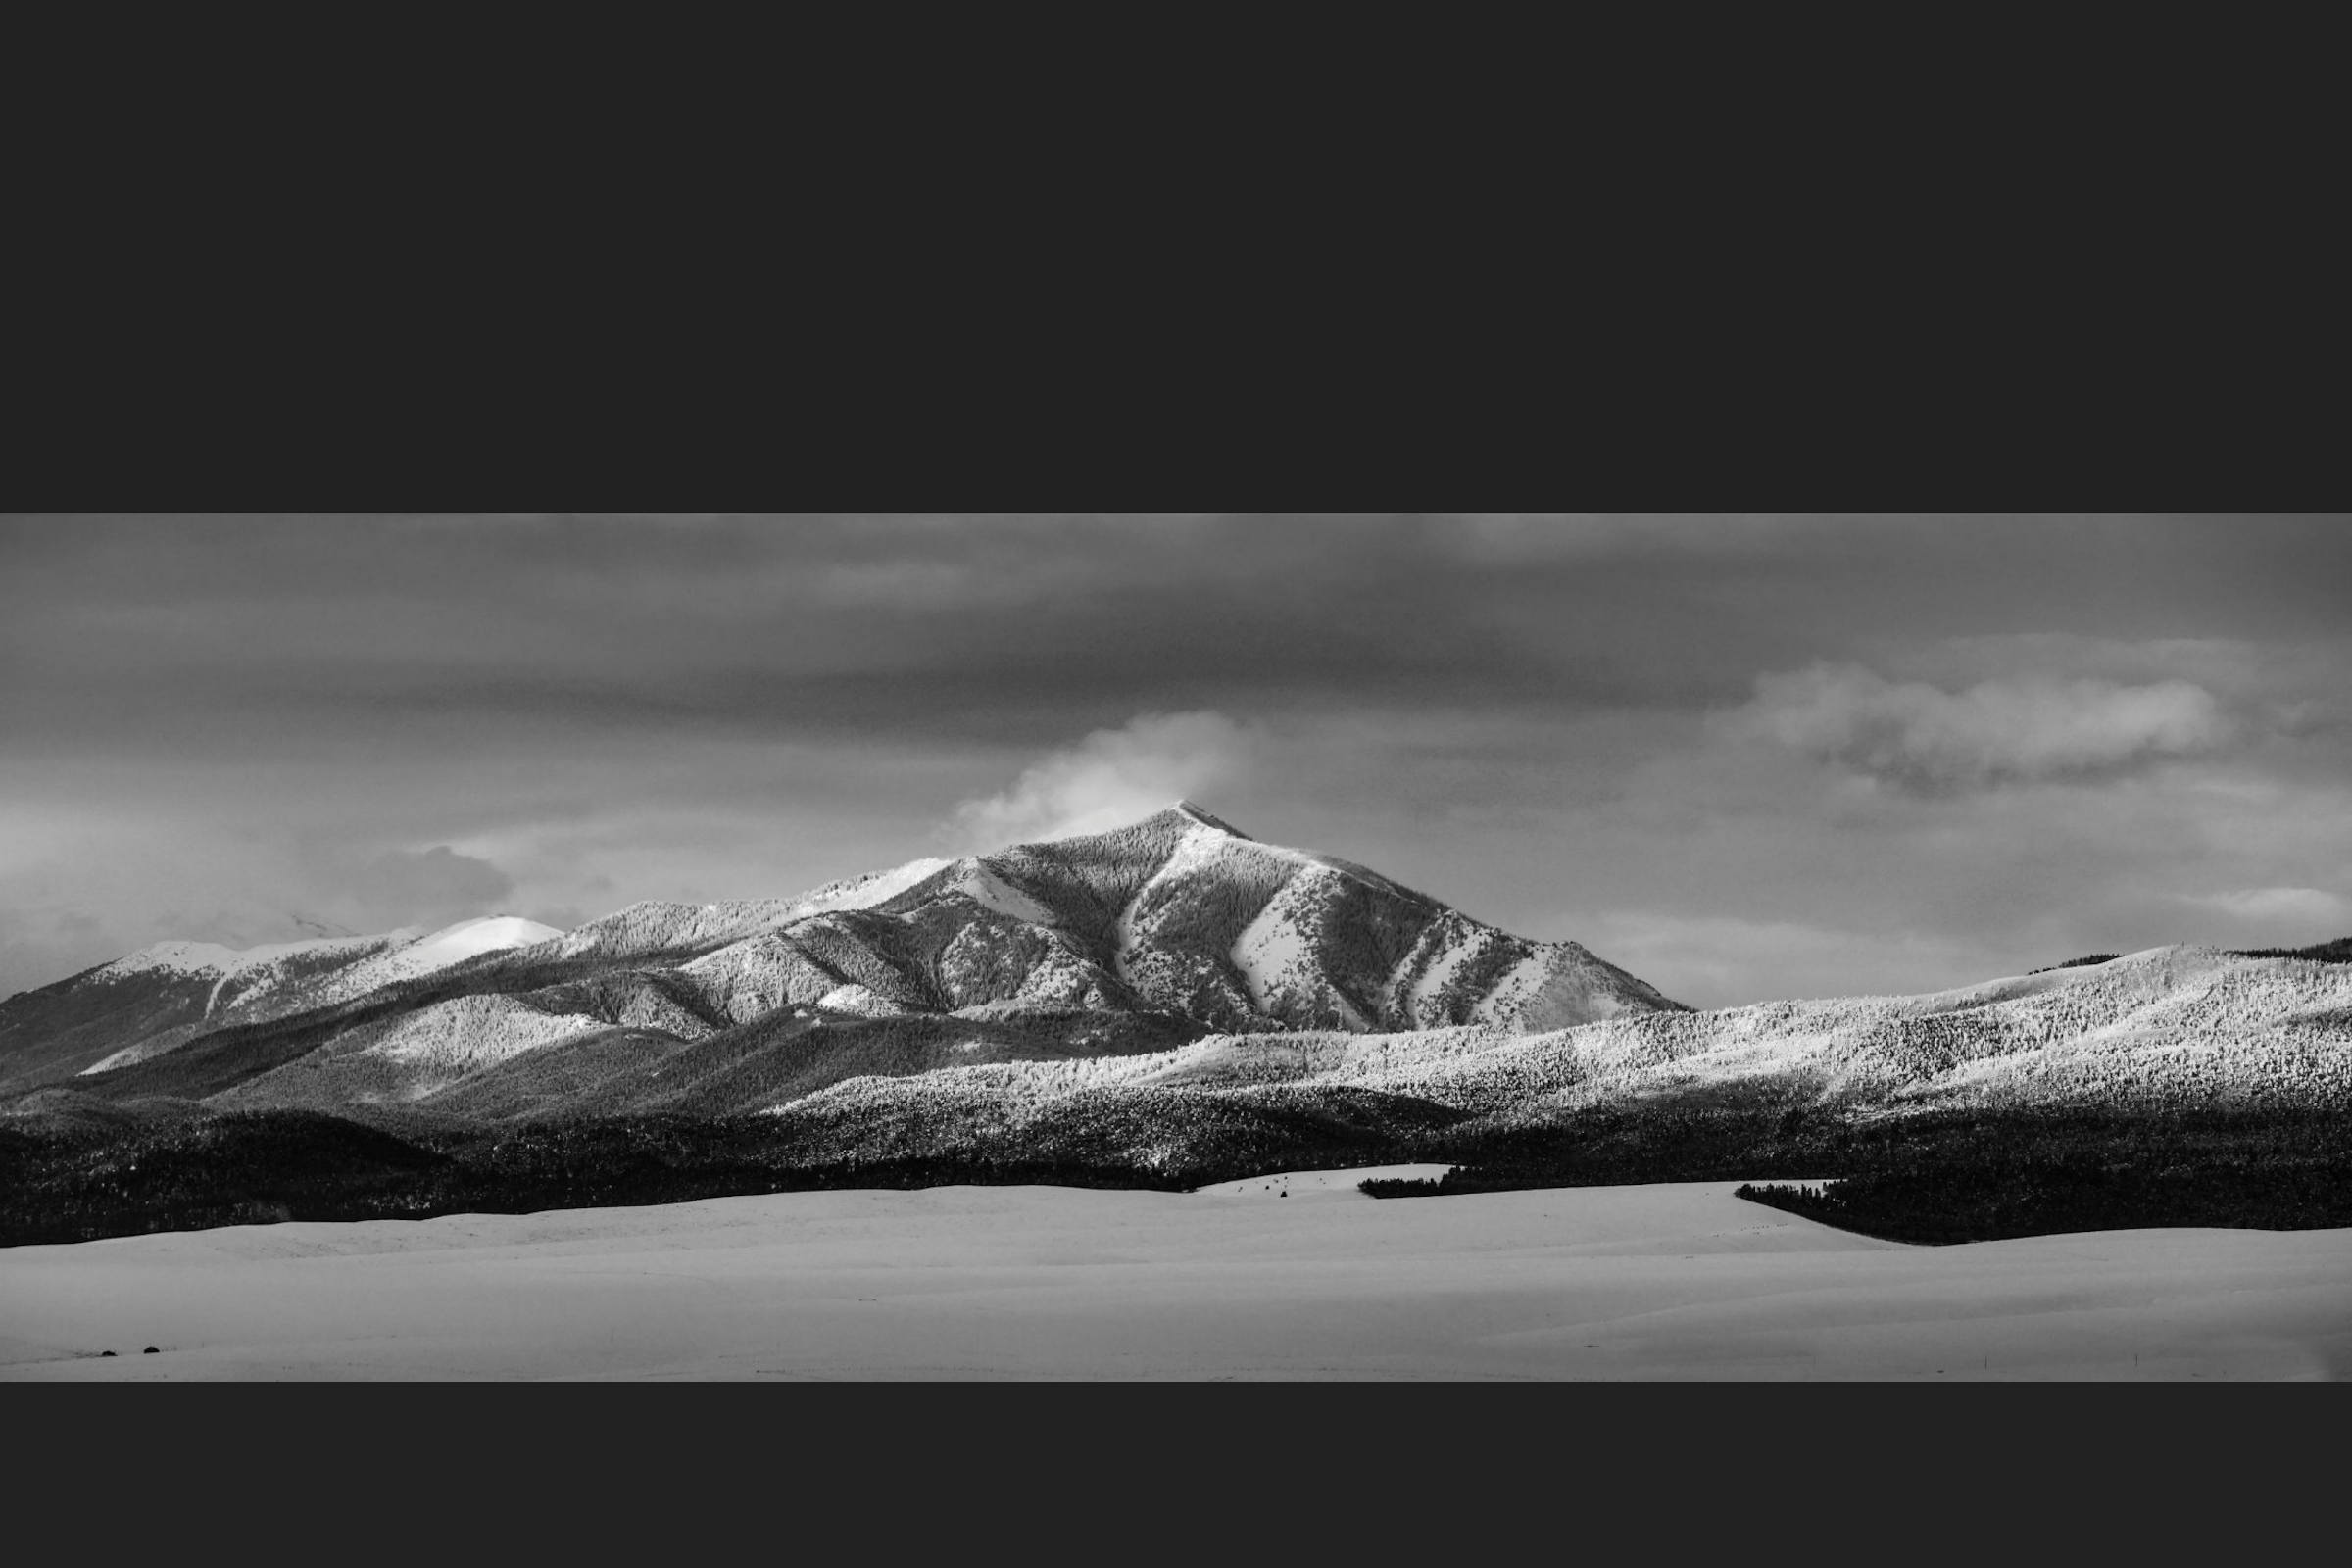 Winter Morning in the Rockies II